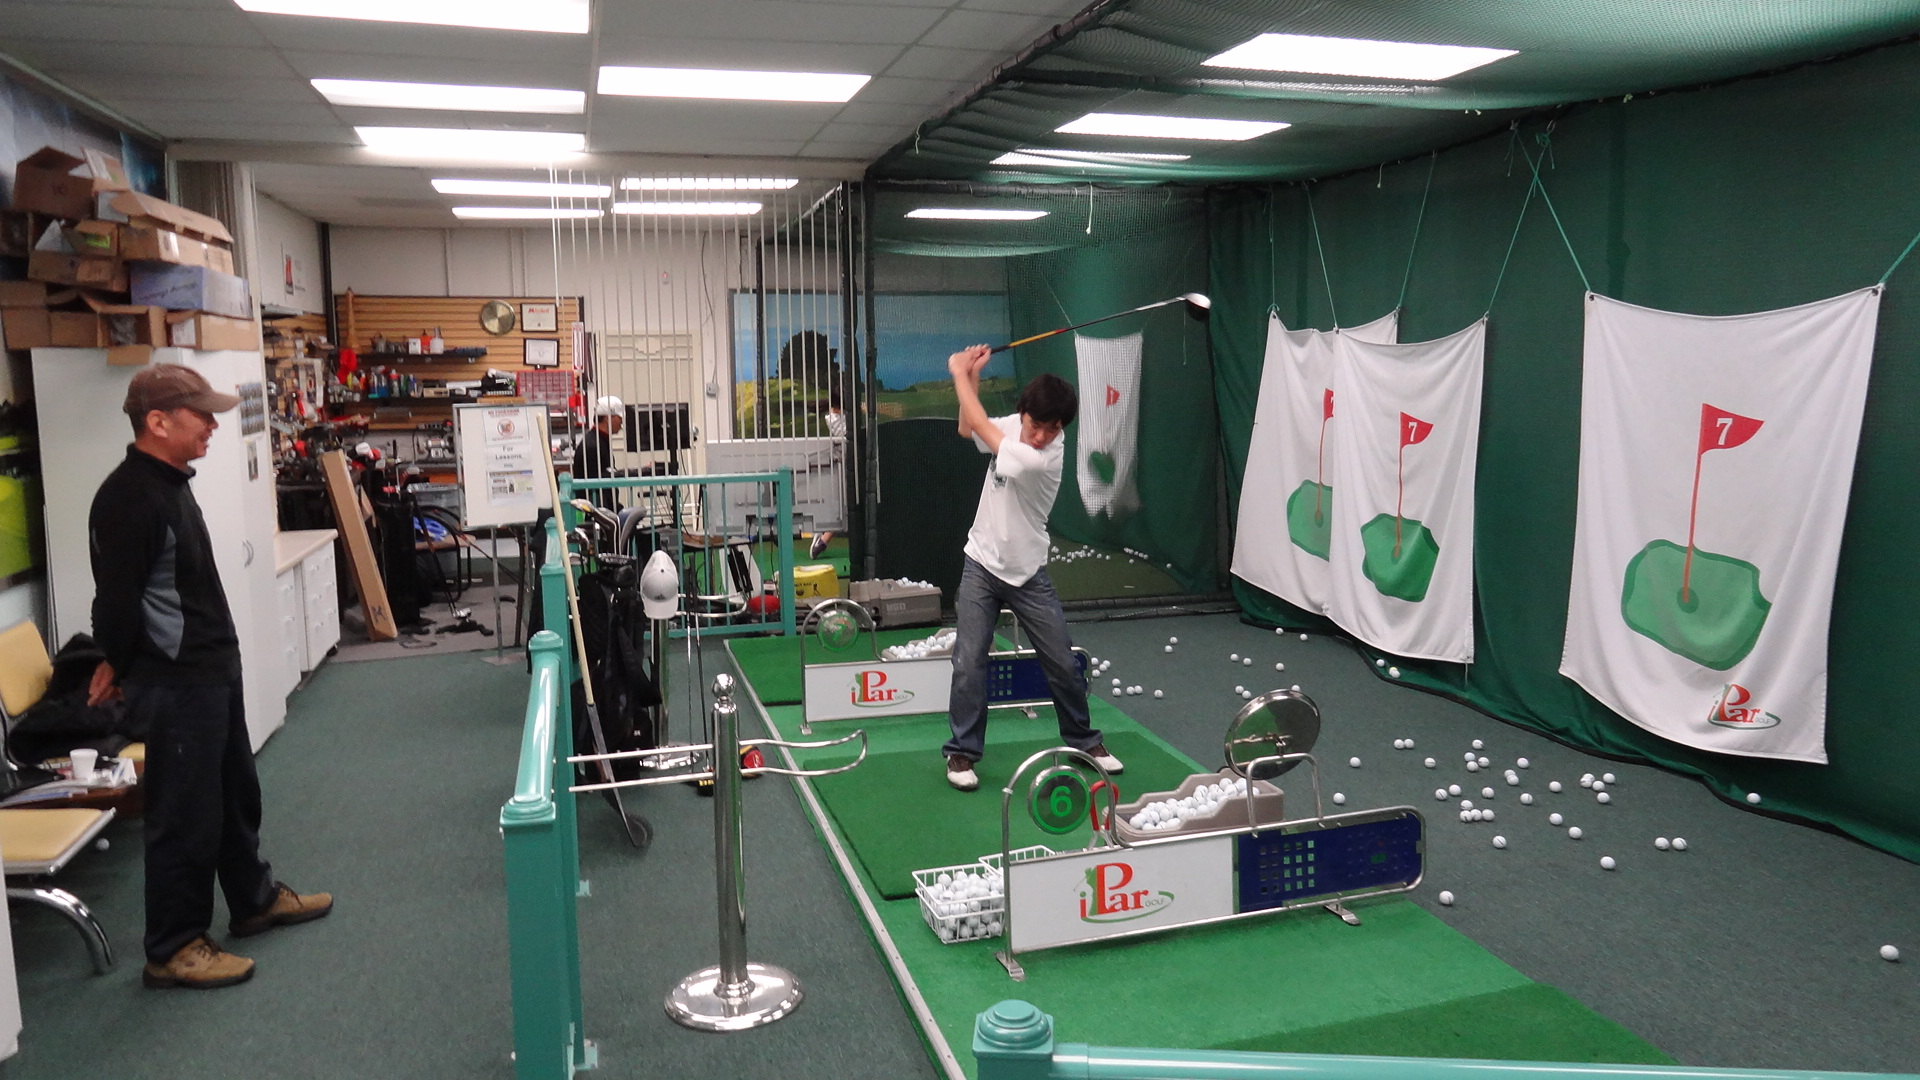 Ipar golf academy in santa clara ca 95051 for Academy salon santa clara